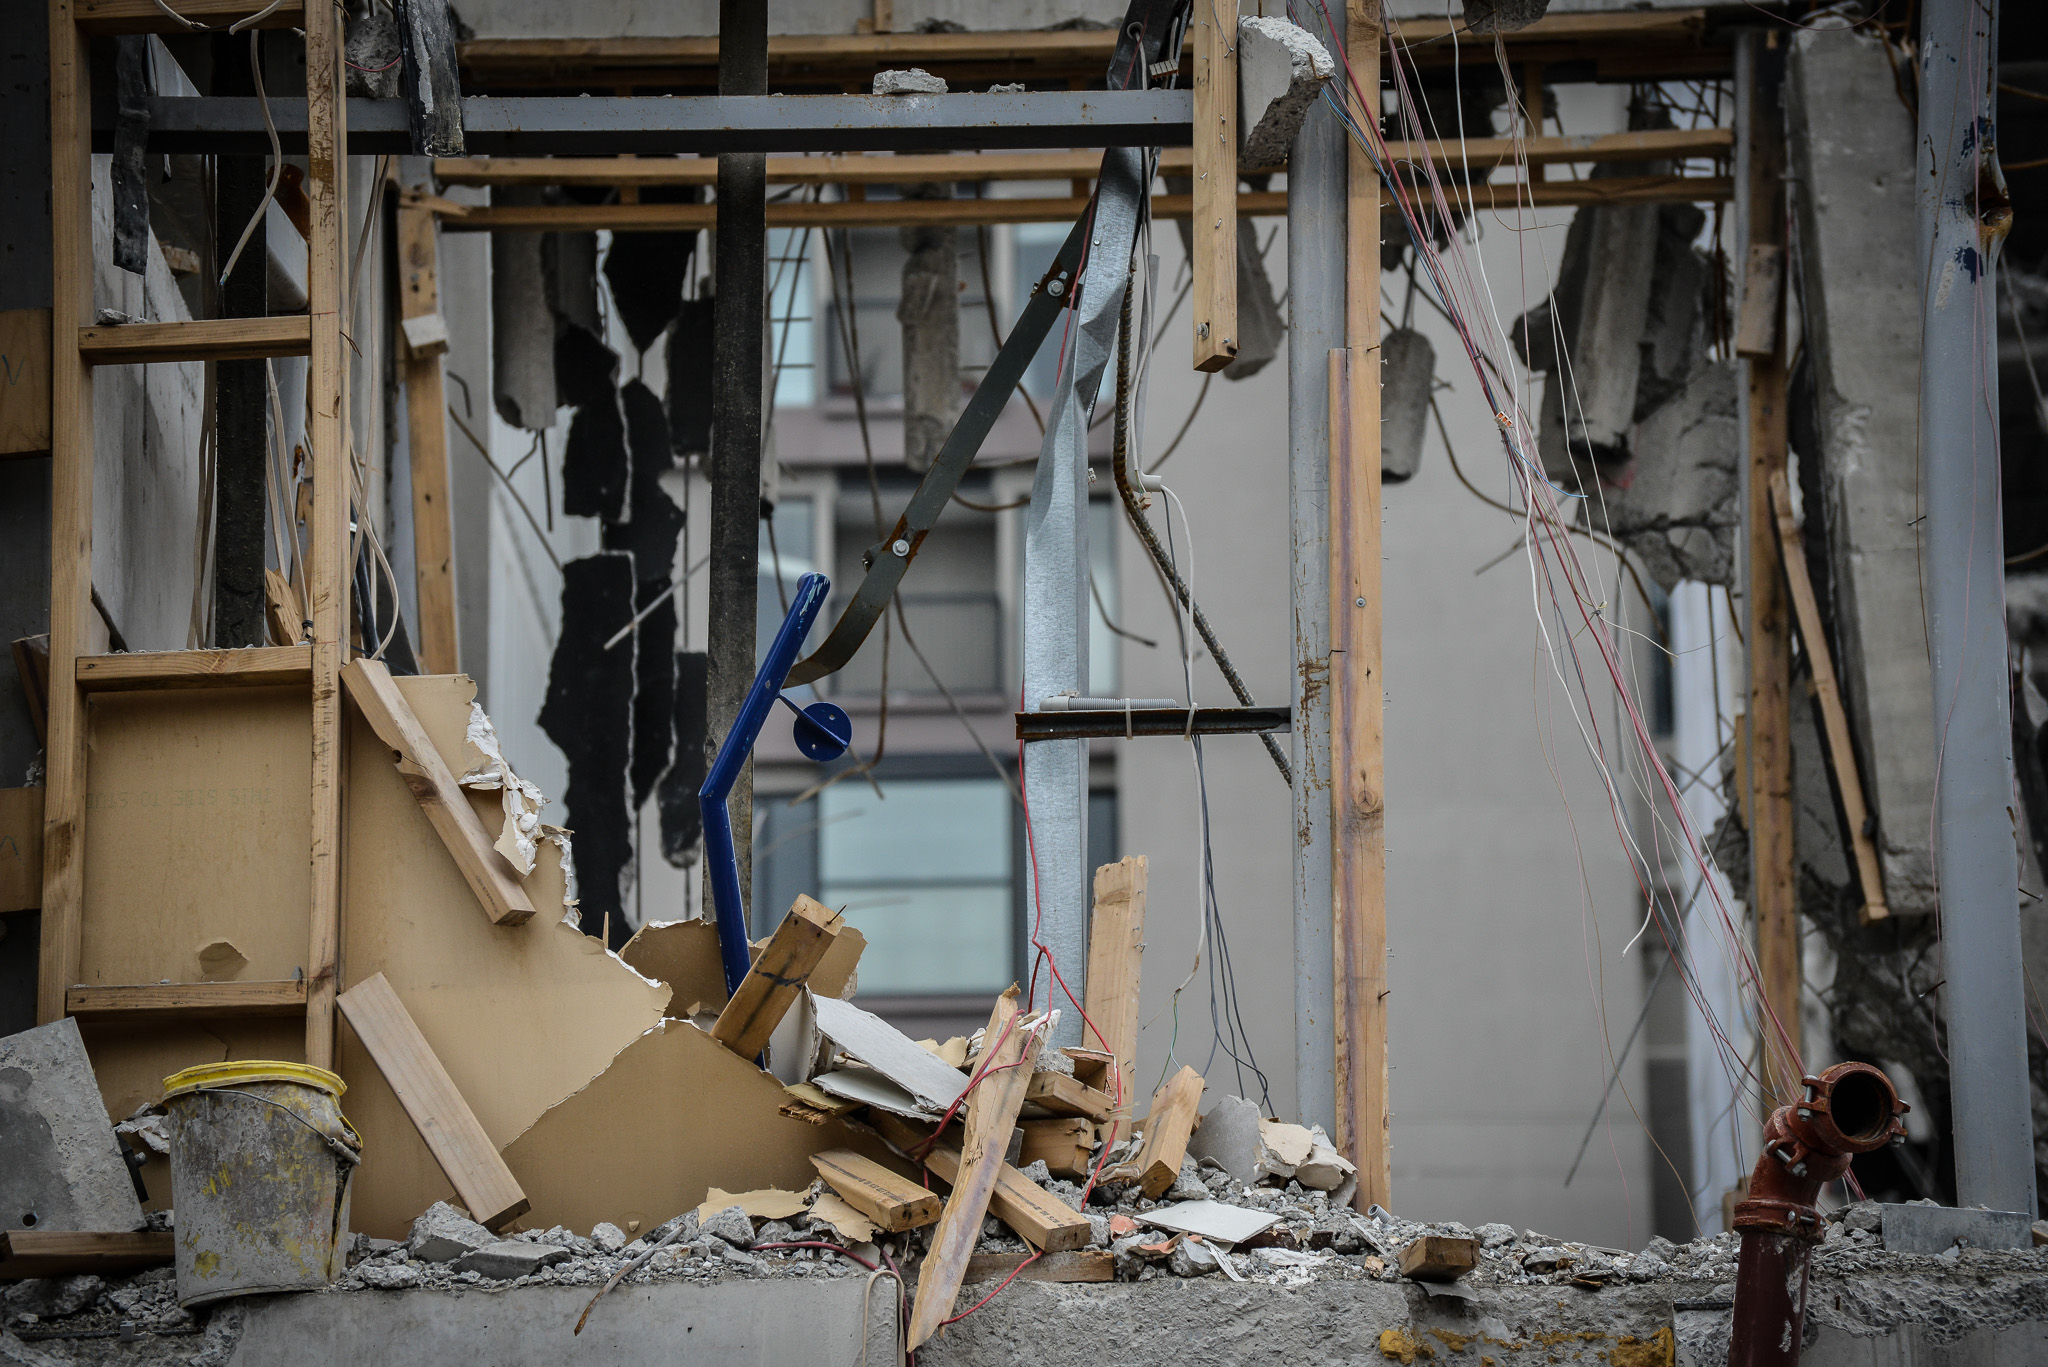 2011 Earthquake, Christchurch, New Zealand